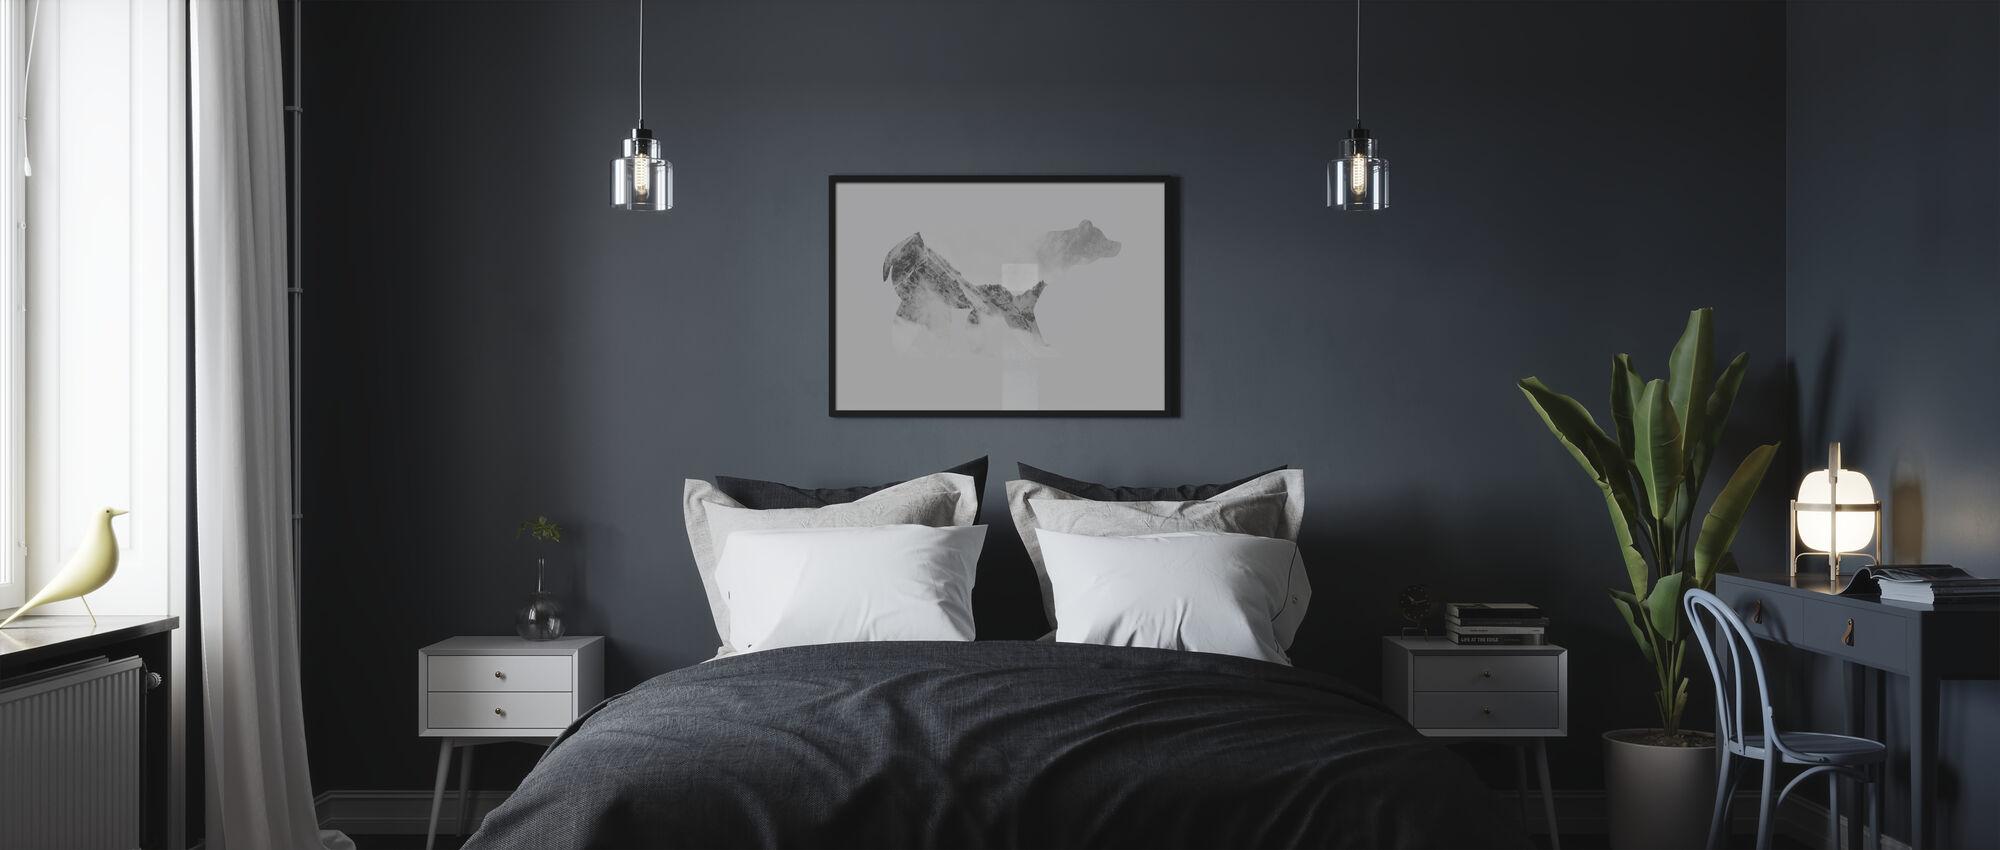 Bear Mountain - Poster - Bedroom